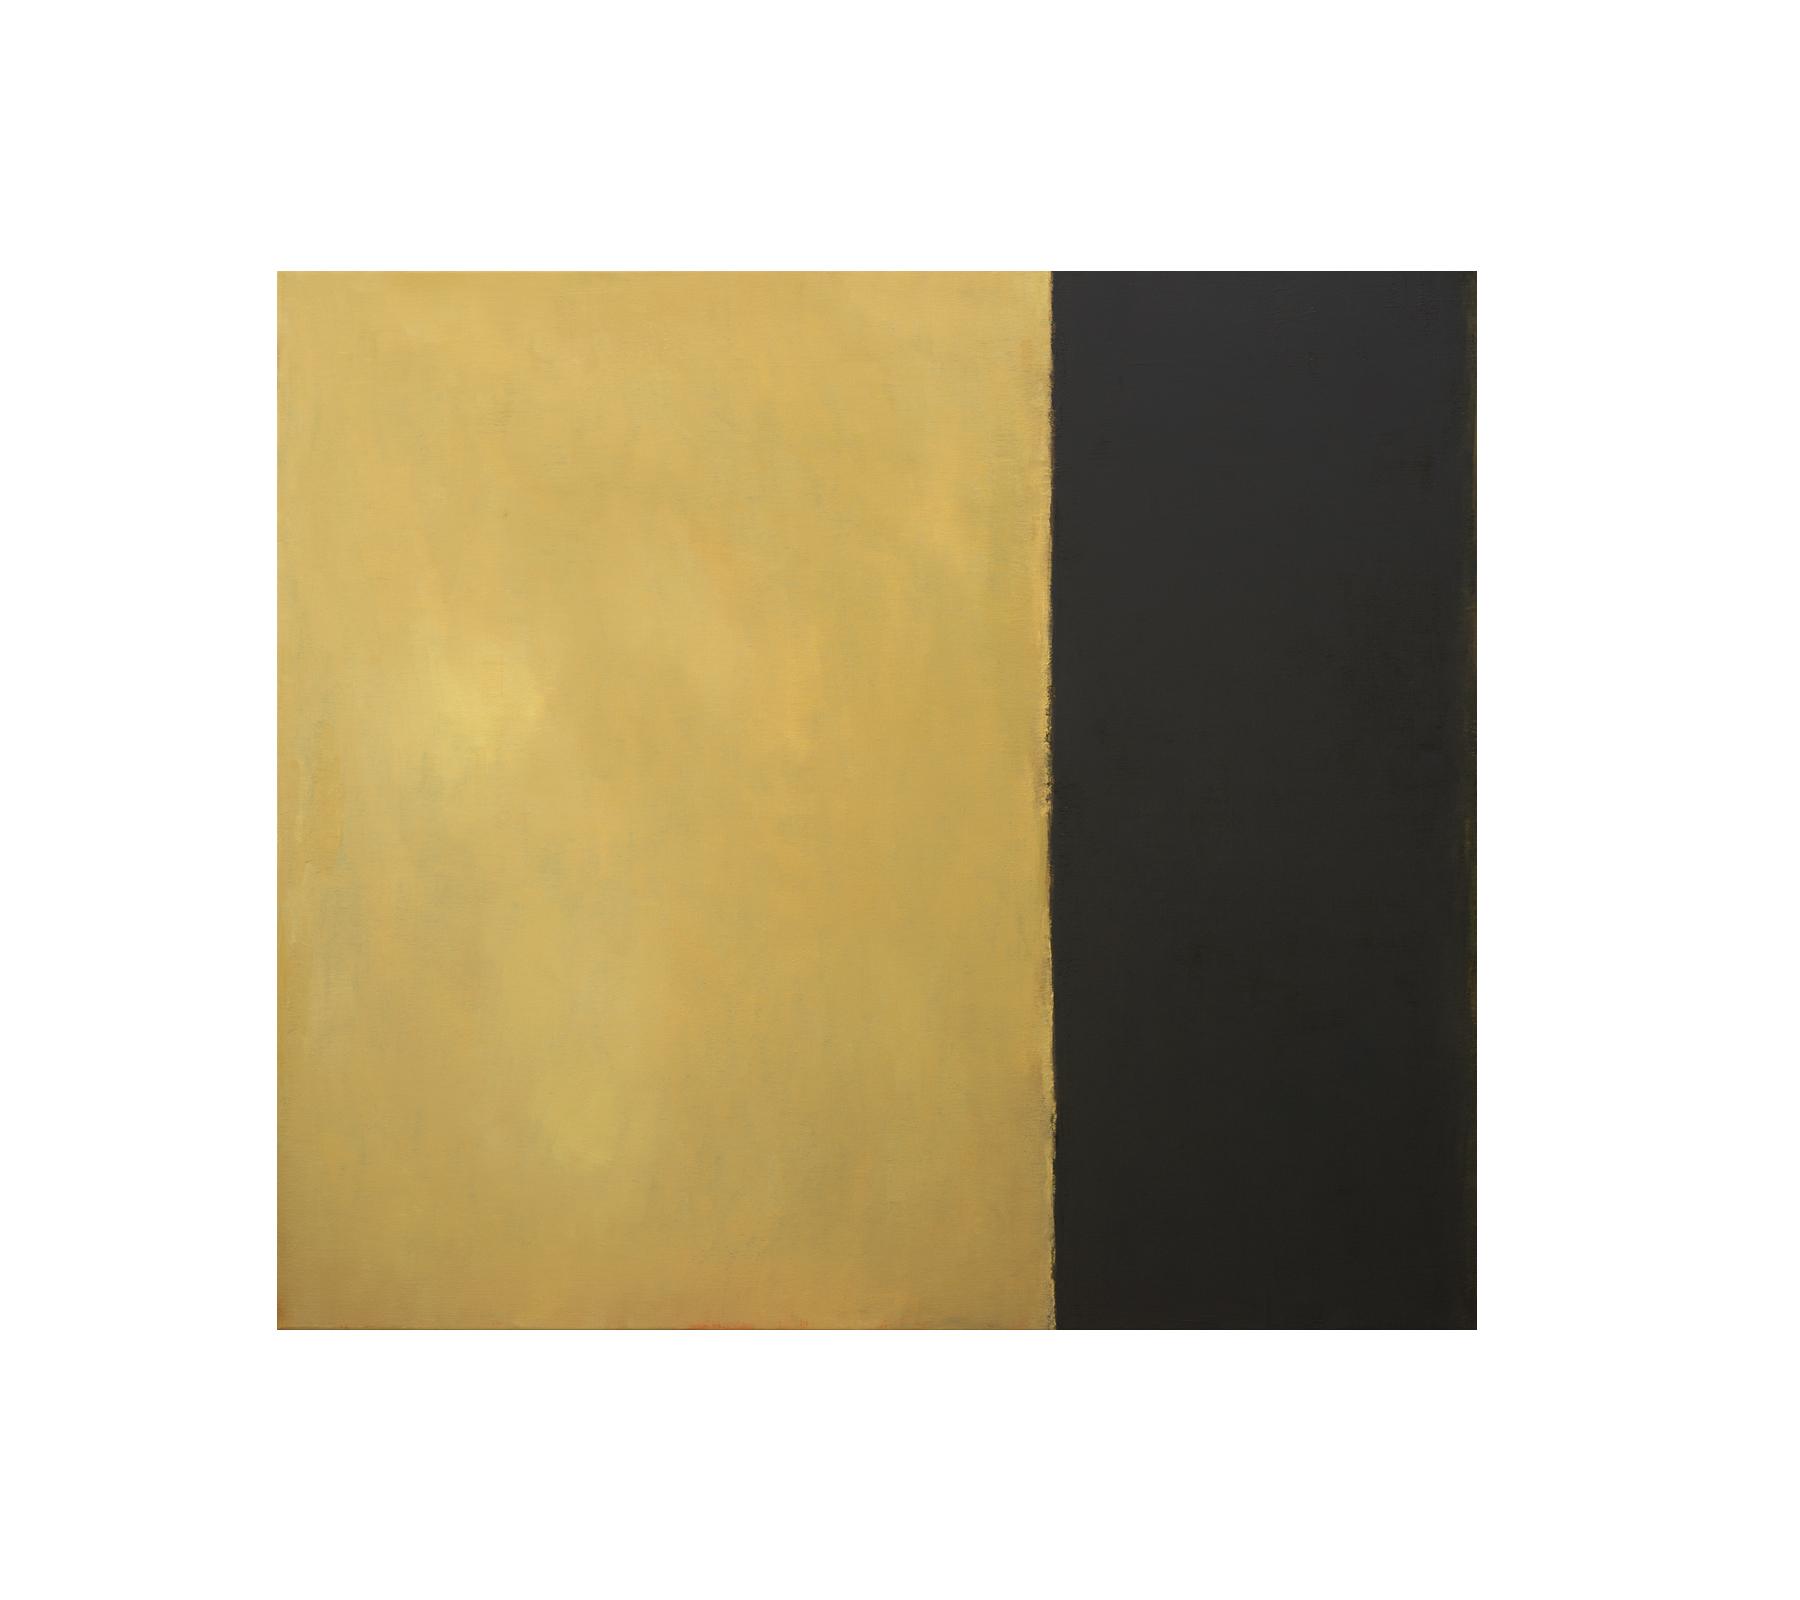 Untitled 2018 150x170cm